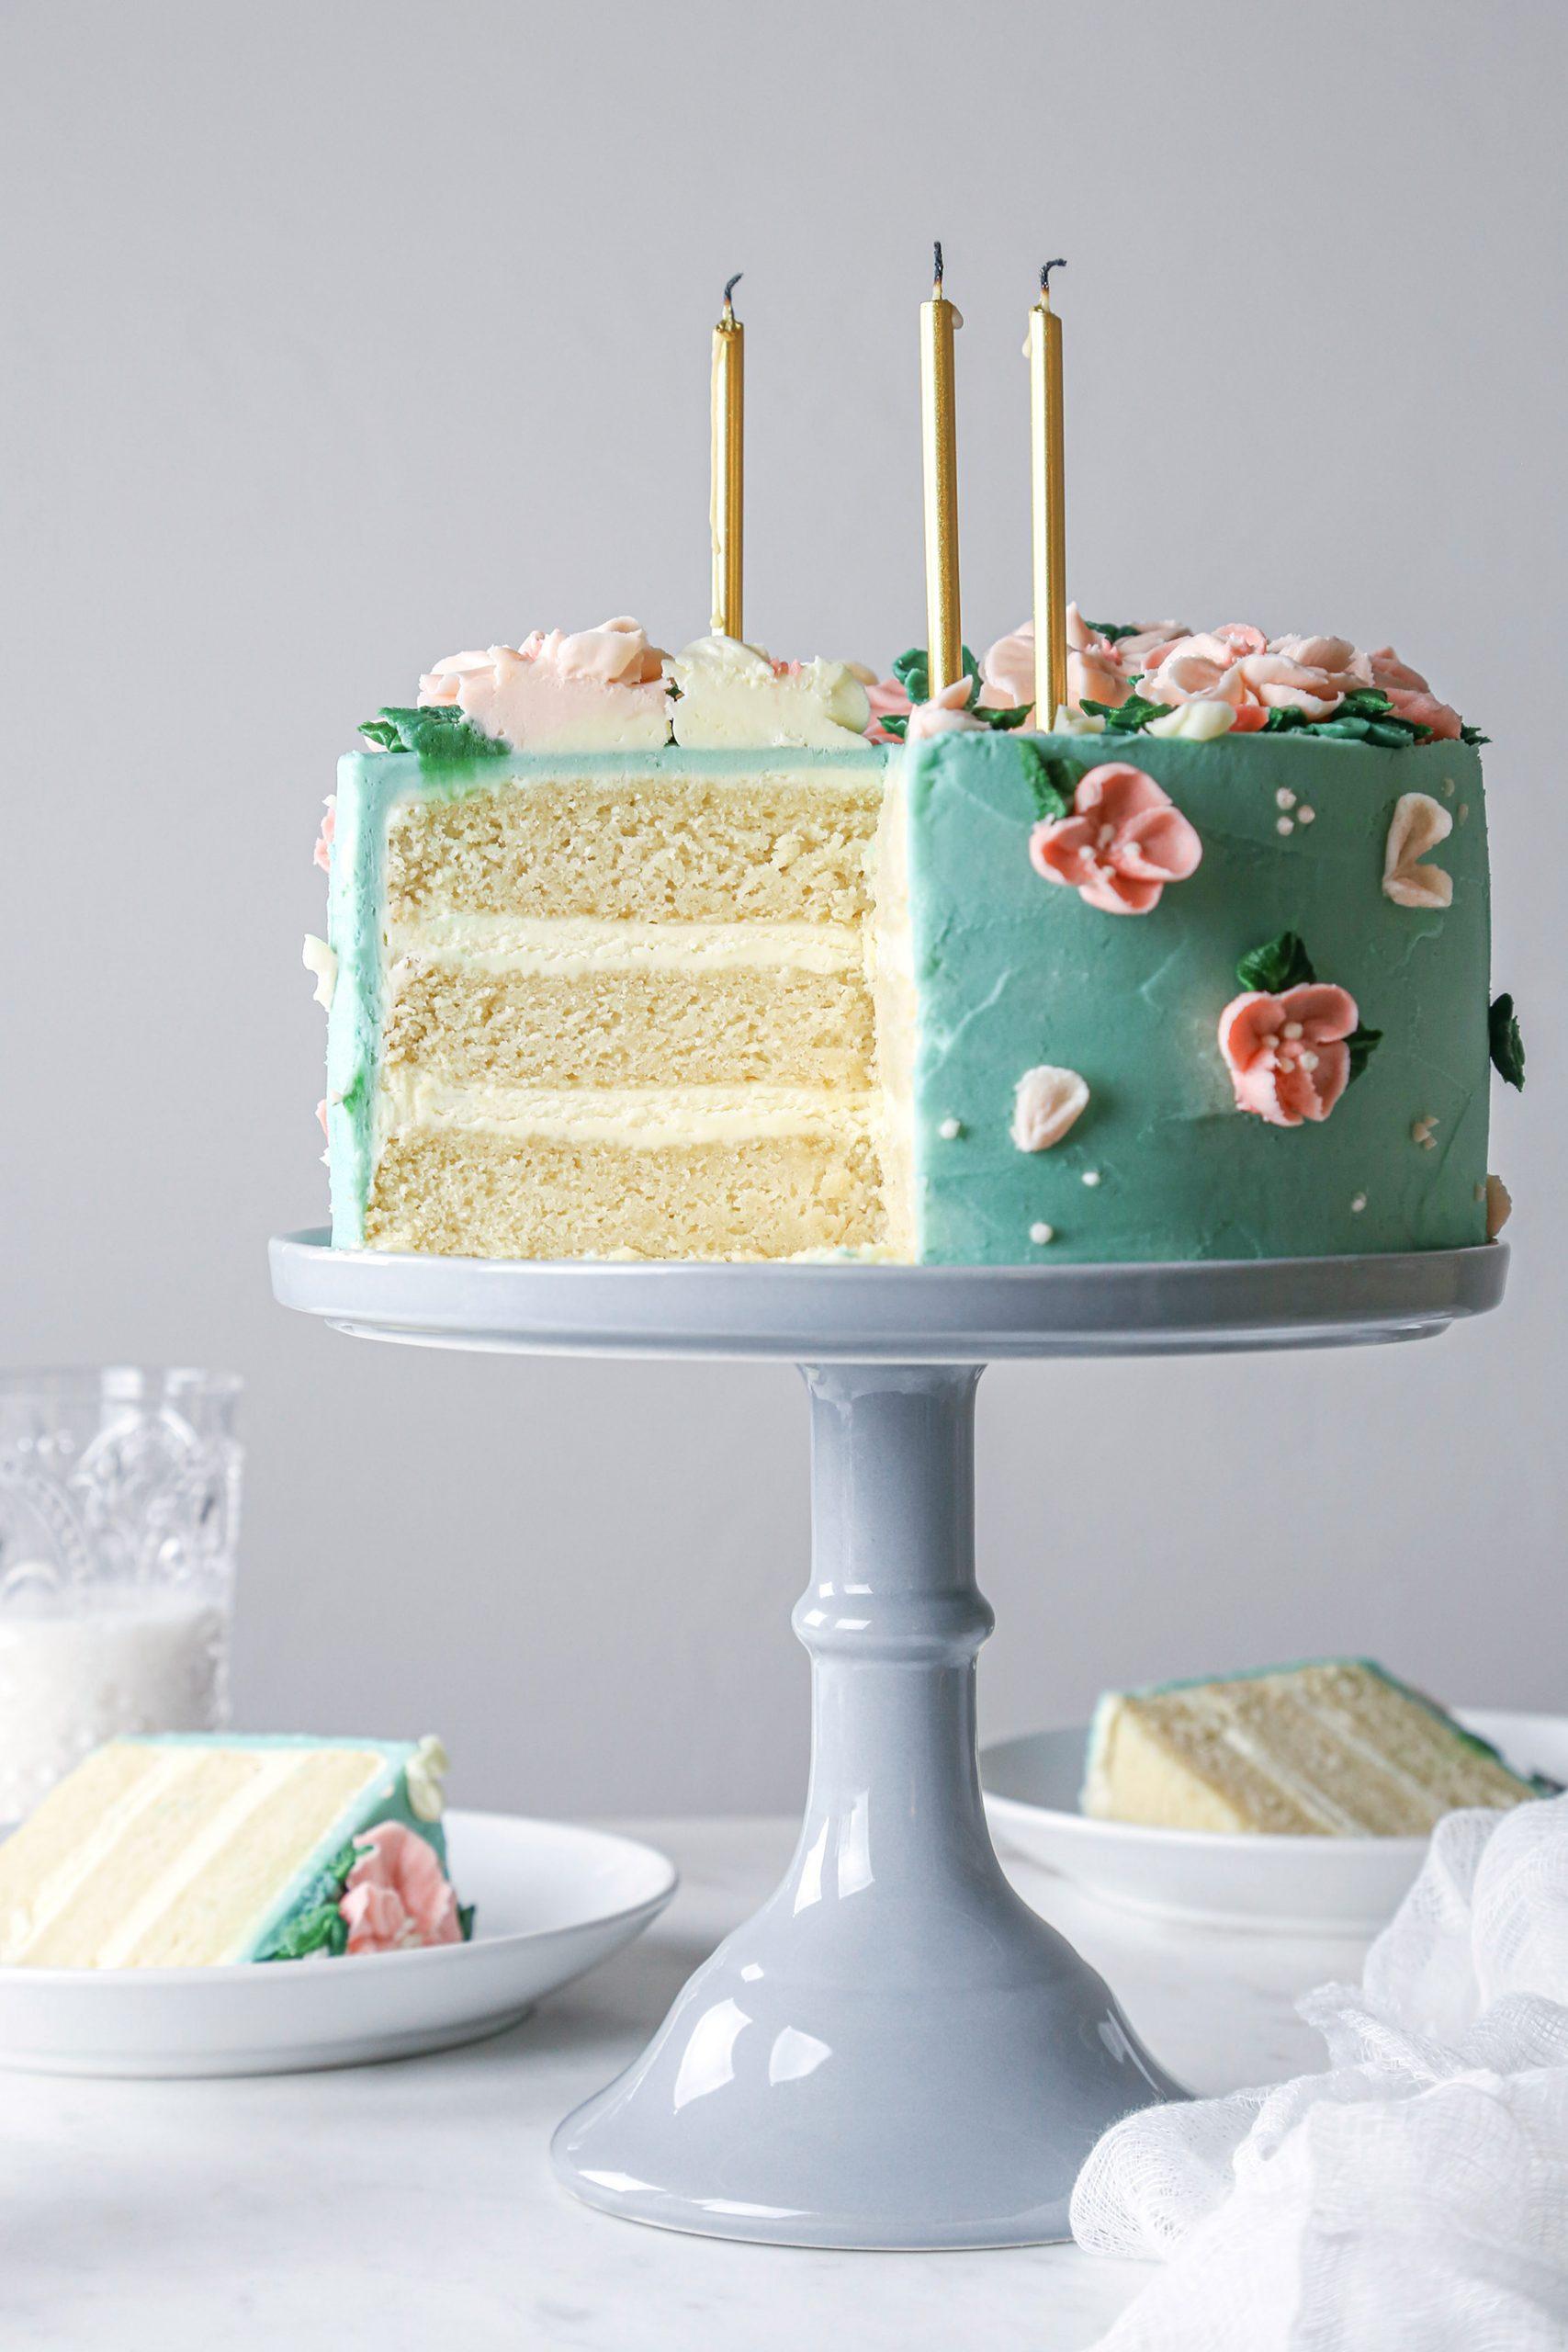 Layered Vanilla Cake with Vanilla Buttercream